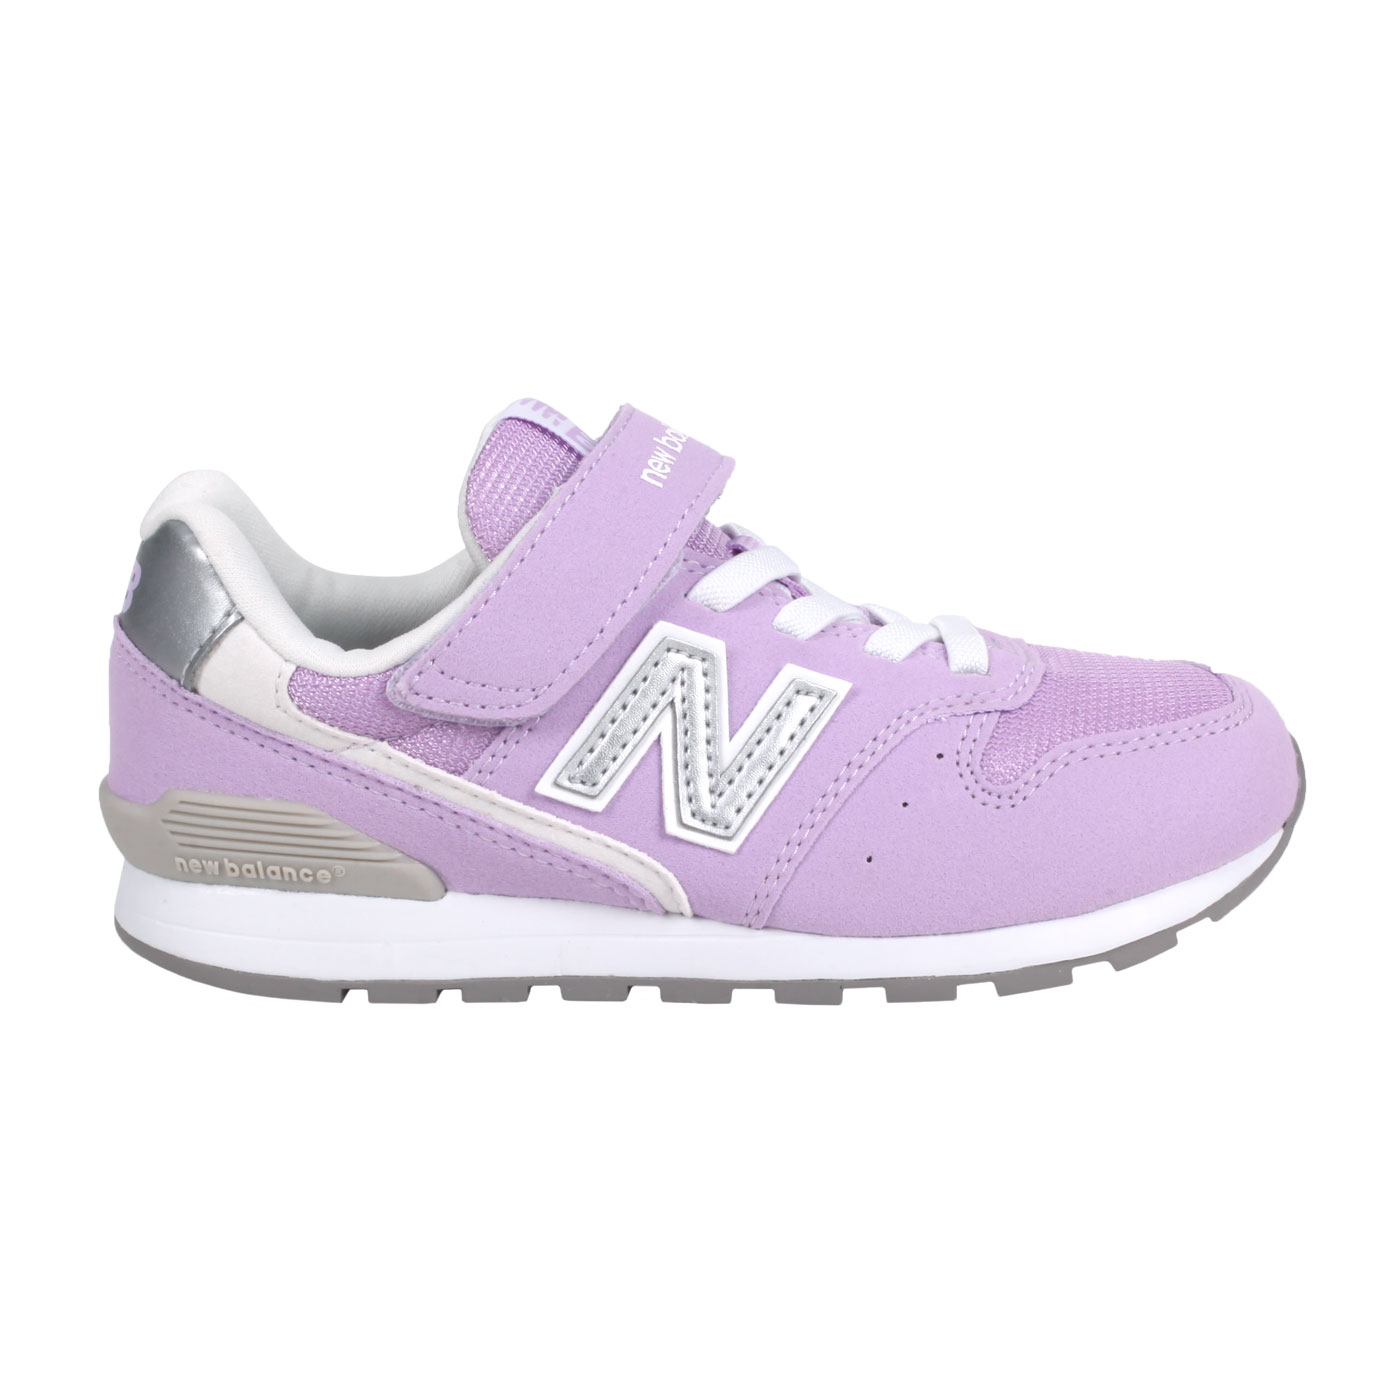 NEW BALANCE 中童休閒運動鞋-WIDE YV996LC3 - 紫銀